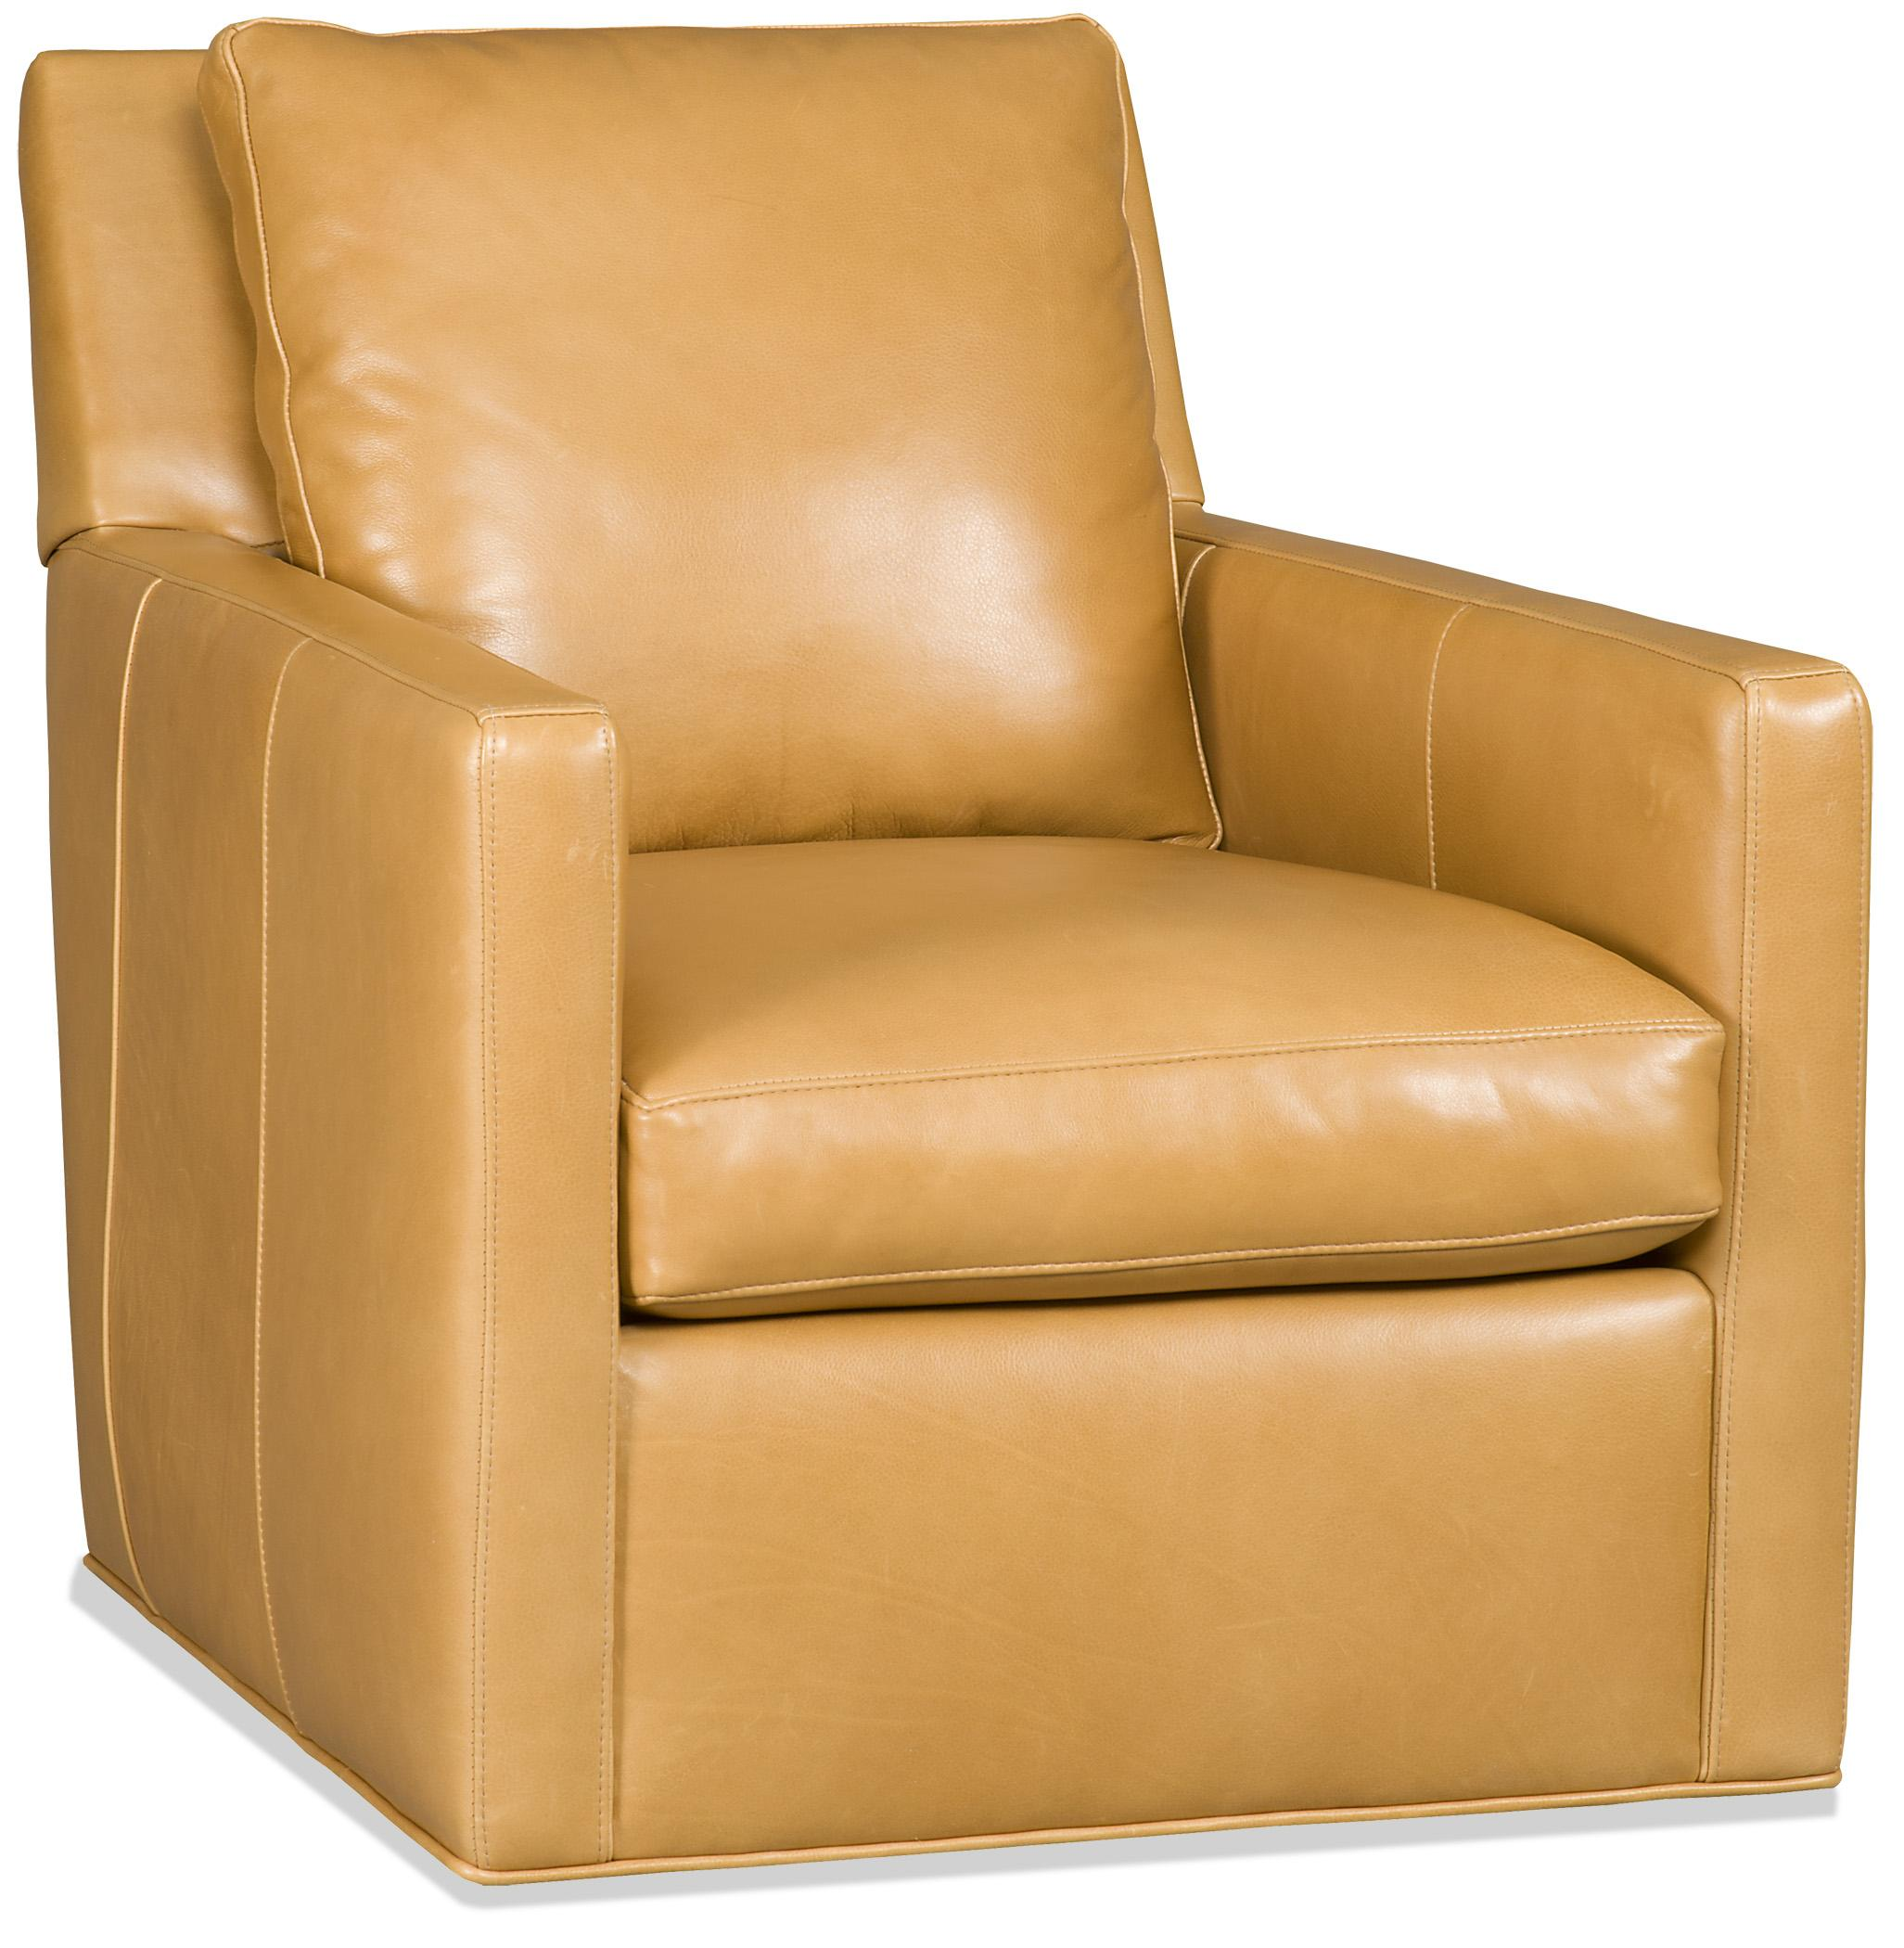 swivel tub chairs red chair nwpa ibu bradington young jaxton